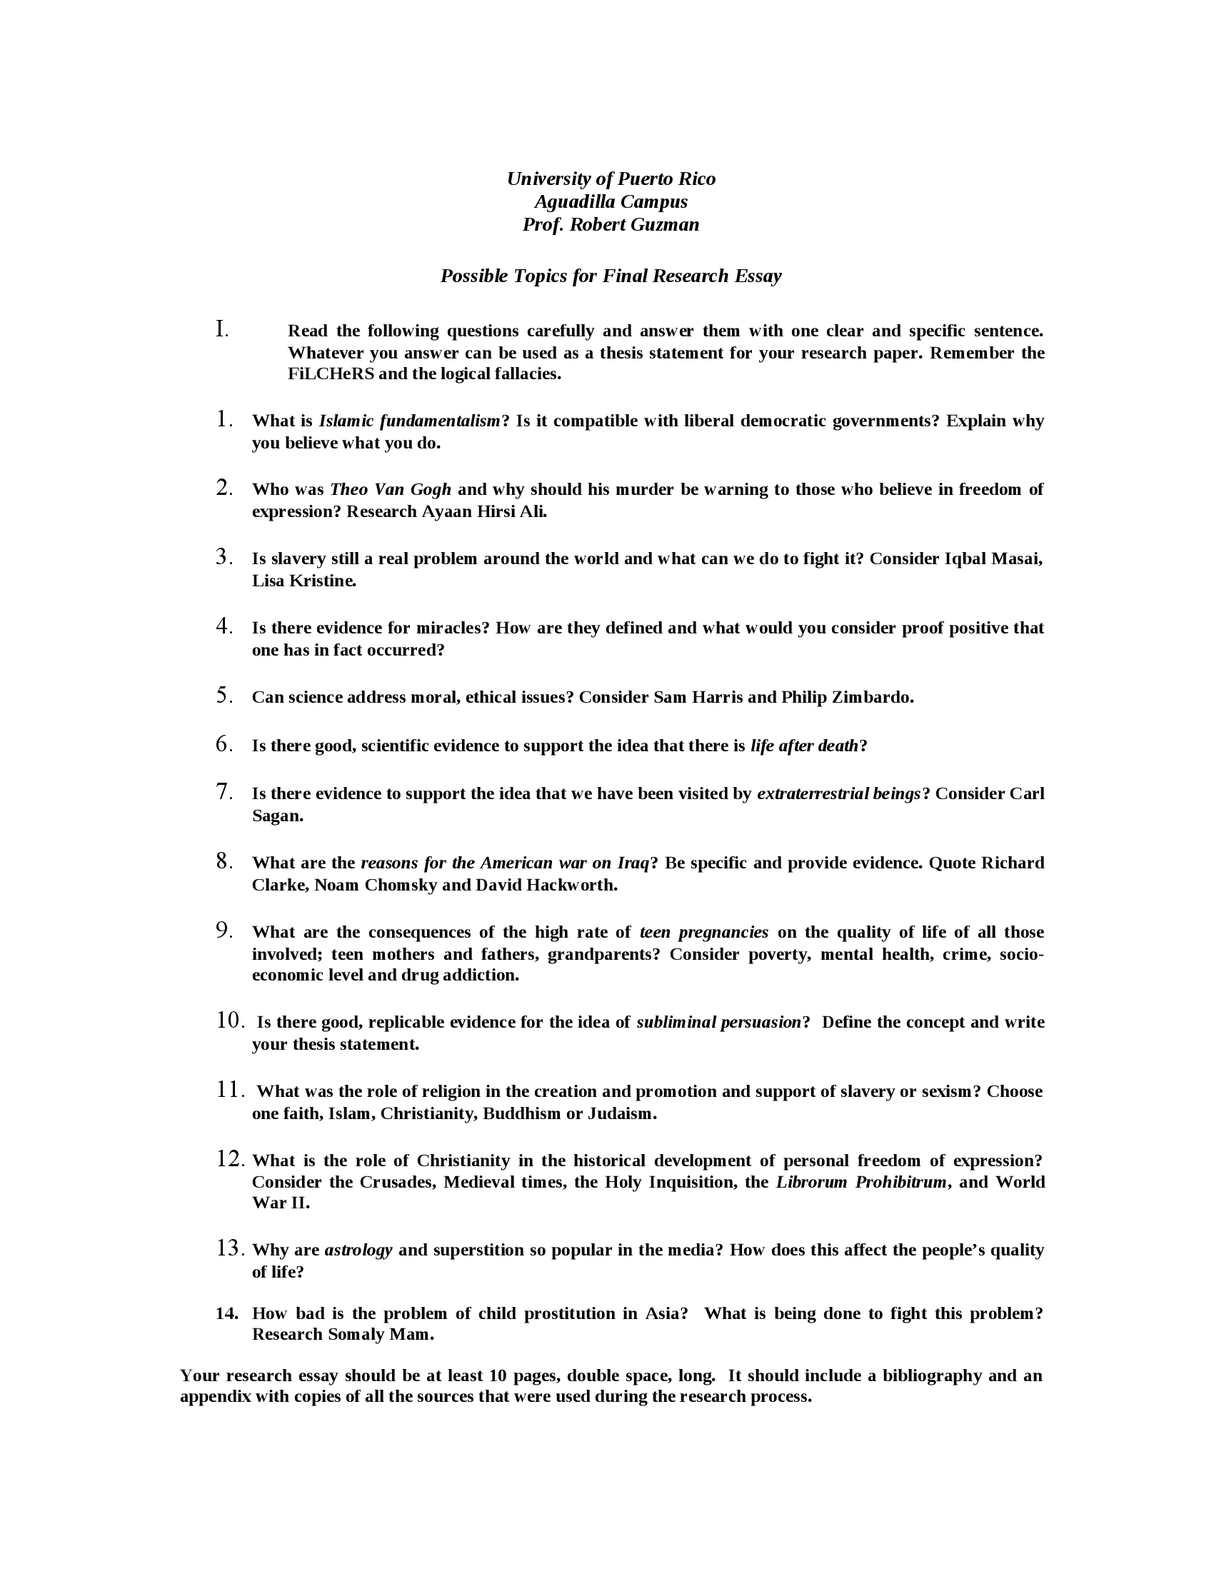 ww2 argumentative essay topics